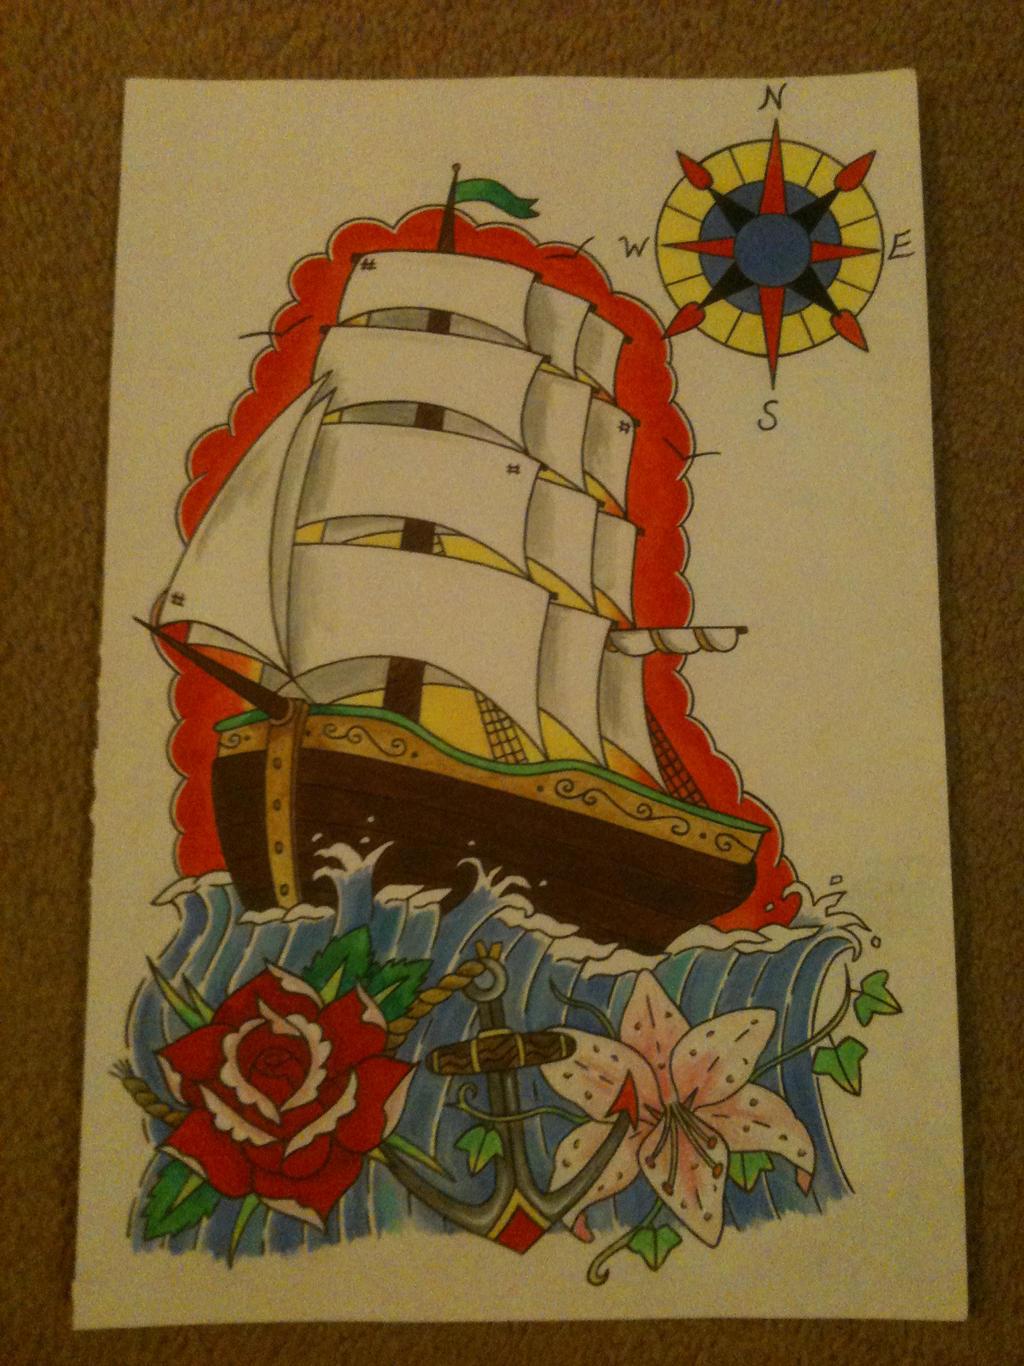 galleon tattoo design by sleepwalker26 on deviantart. Black Bedroom Furniture Sets. Home Design Ideas